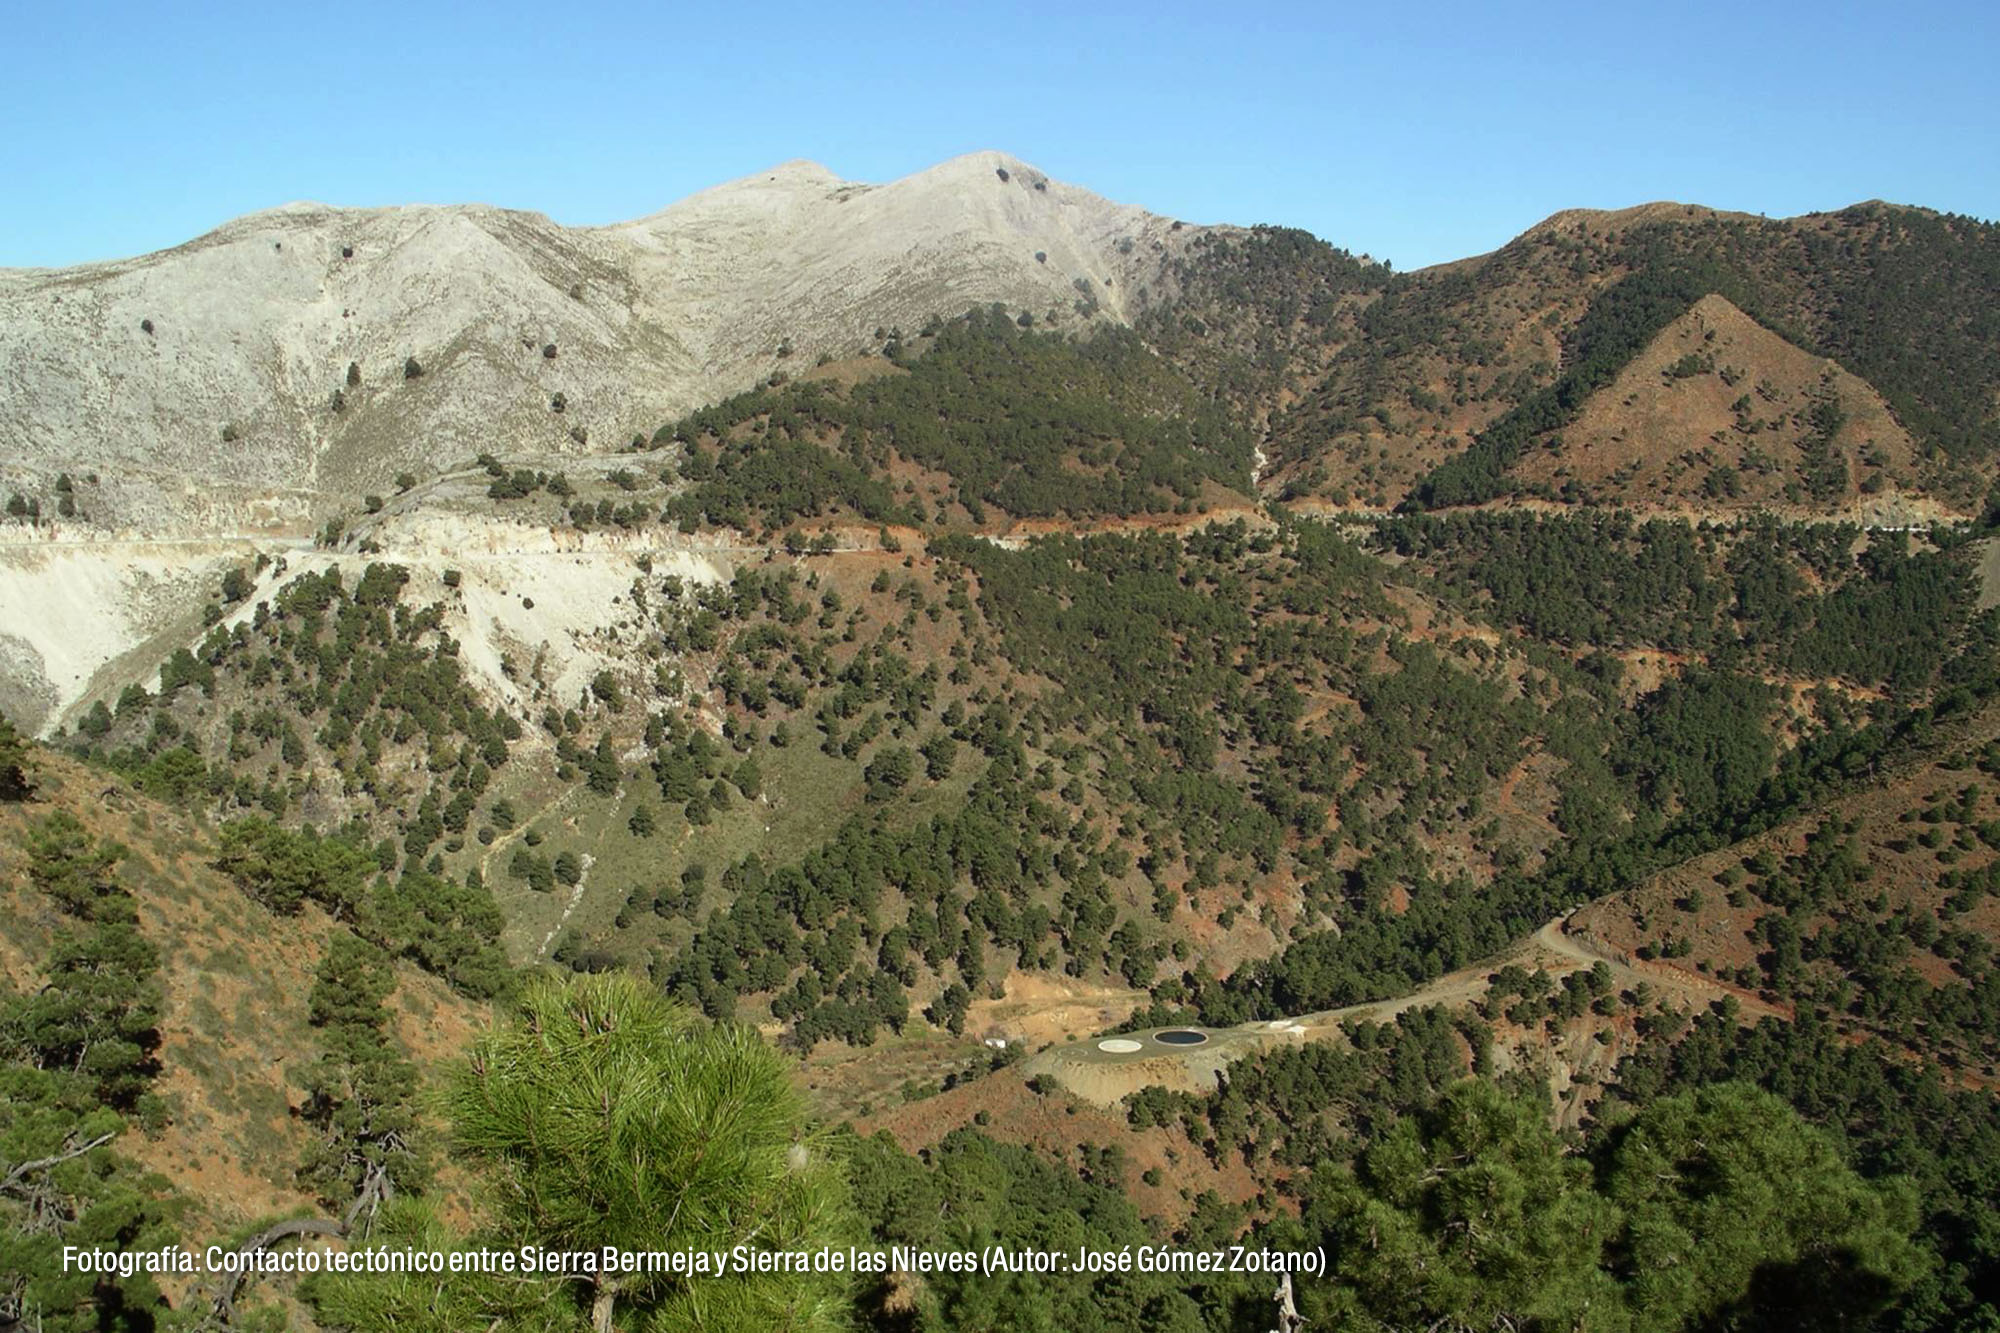 Contacto tectónico Sierra Bermeja y Sierra de las Nieves